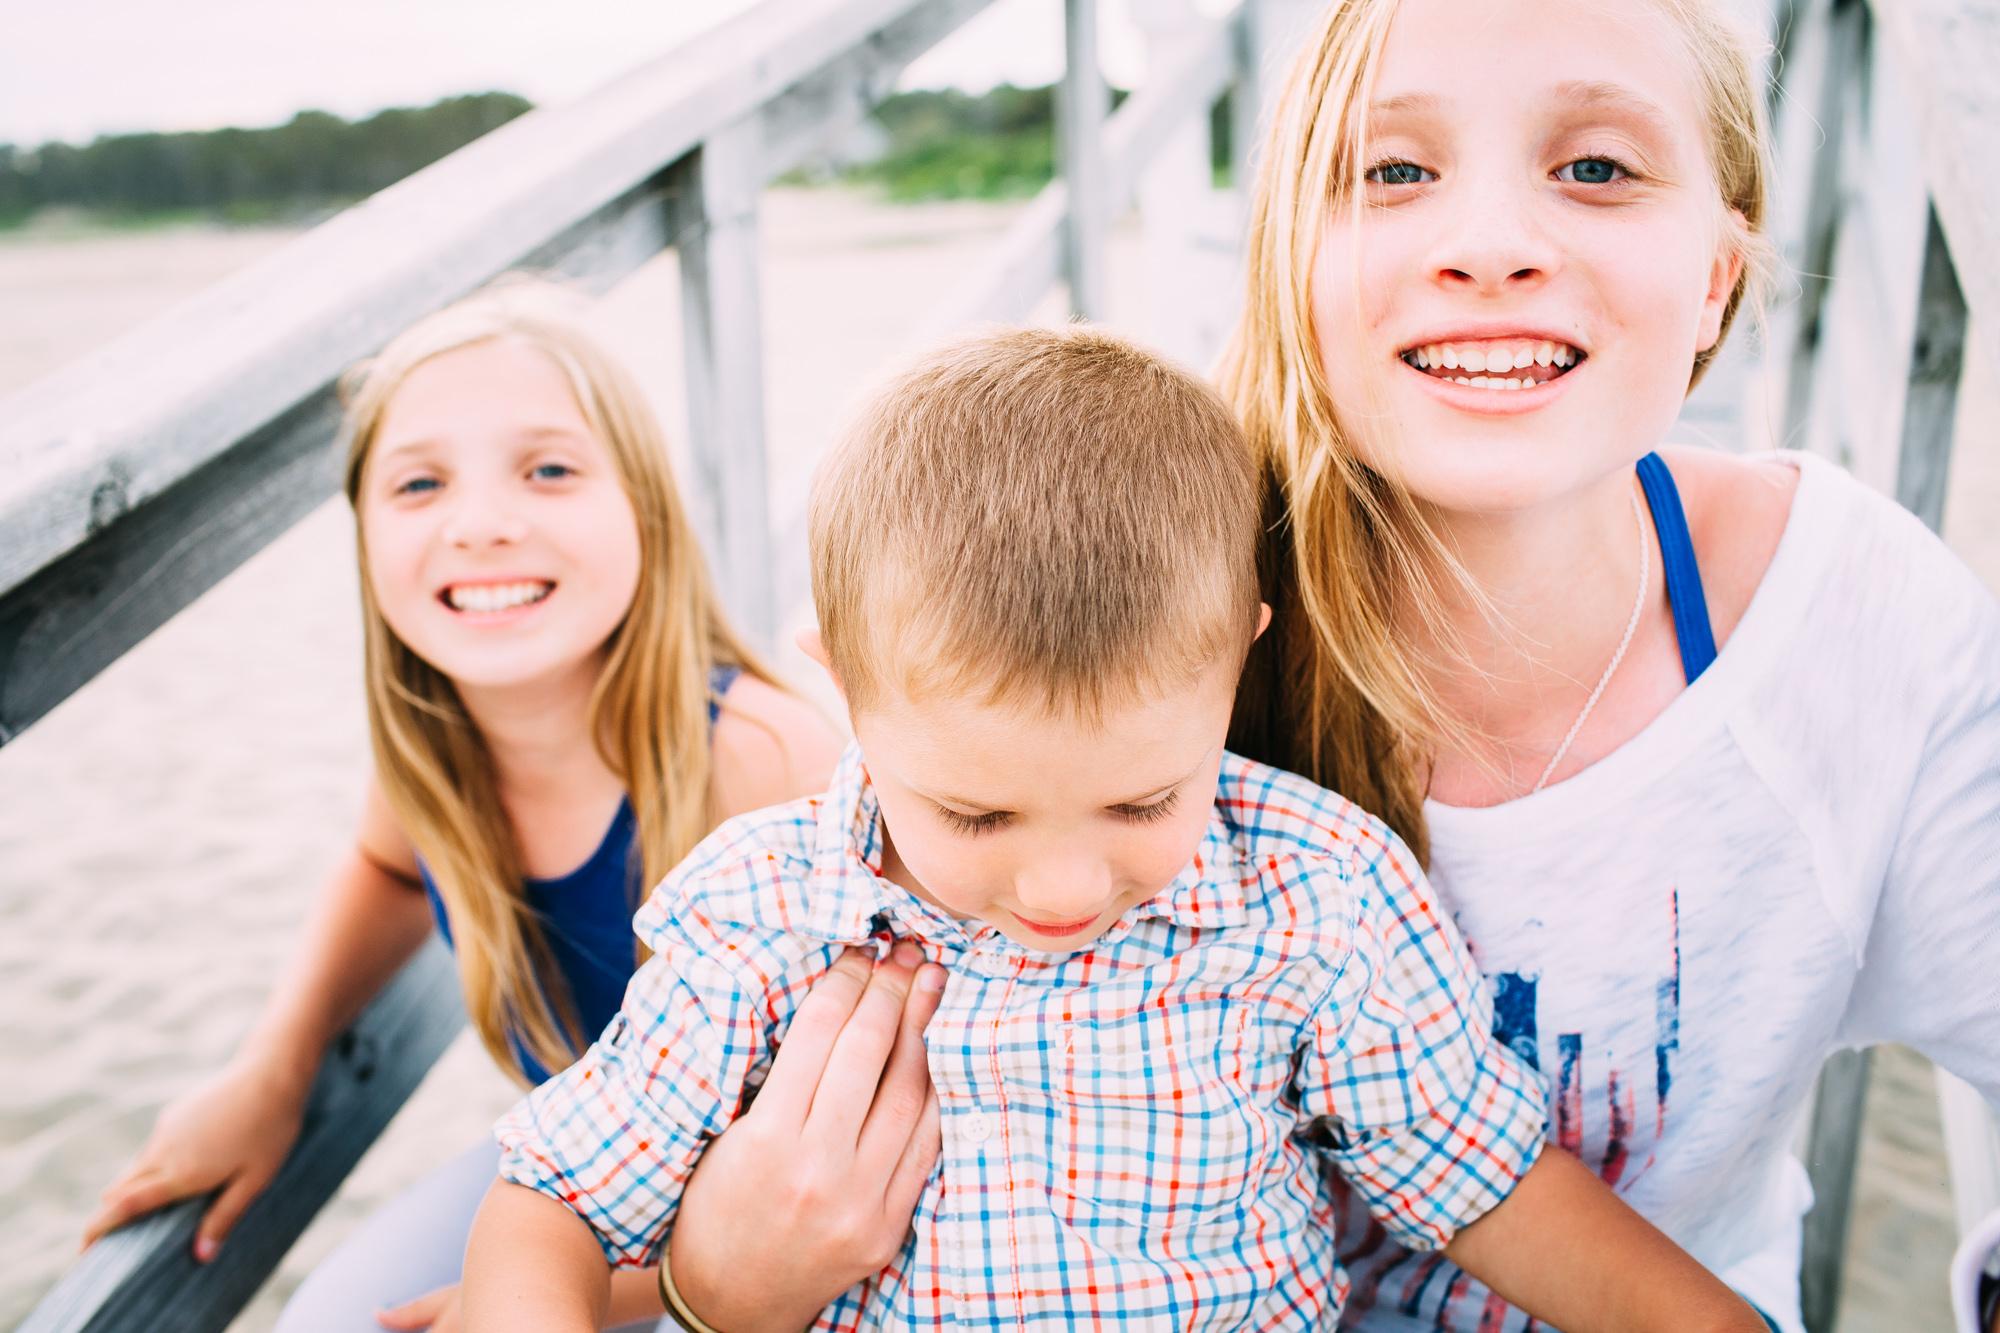 0712_JamieMercurioPhoto_maine-family-vacation-8.jpg